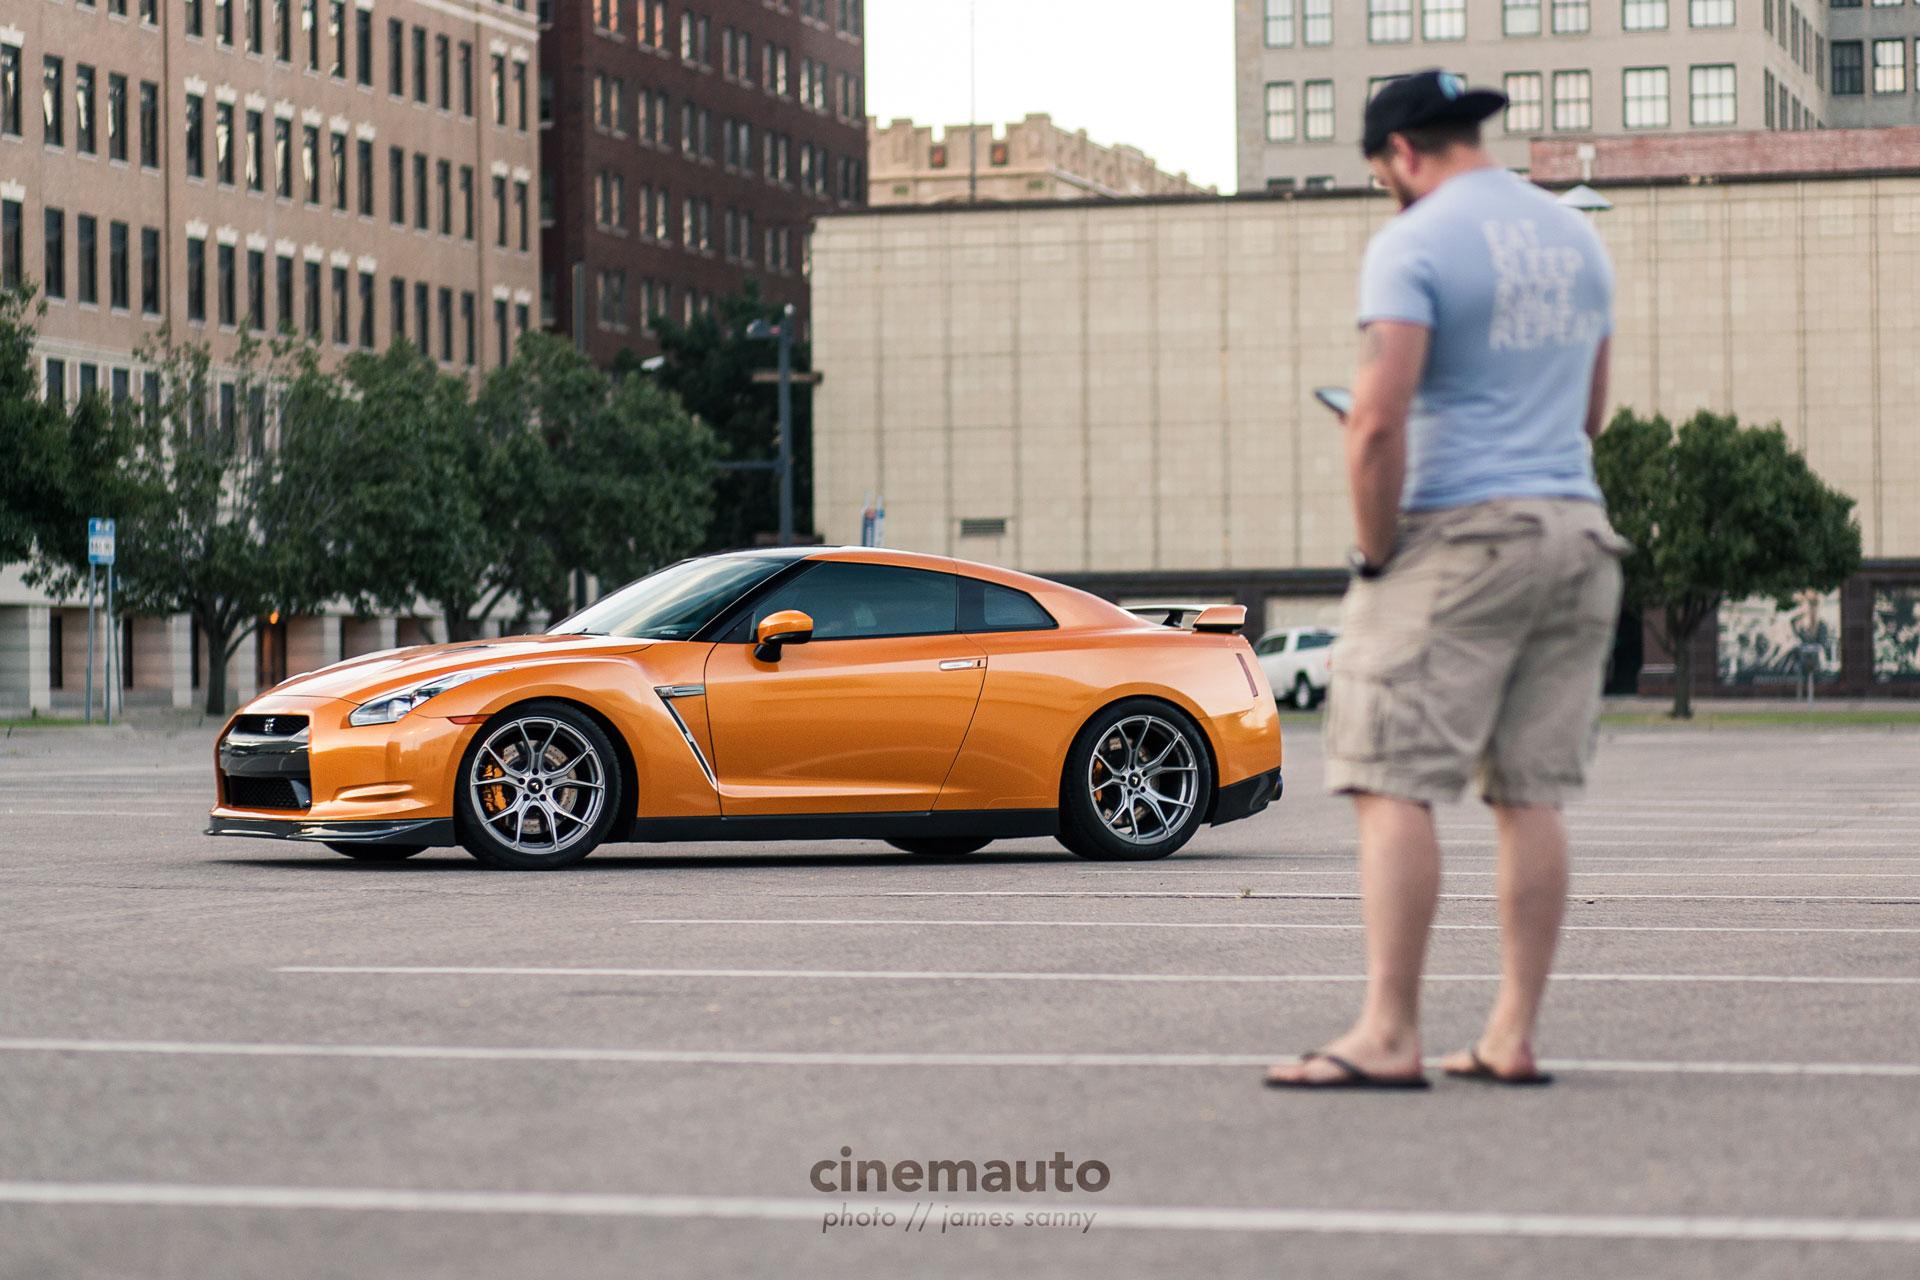 cinemauto-kansas-automotive-photography-pc2.jpg